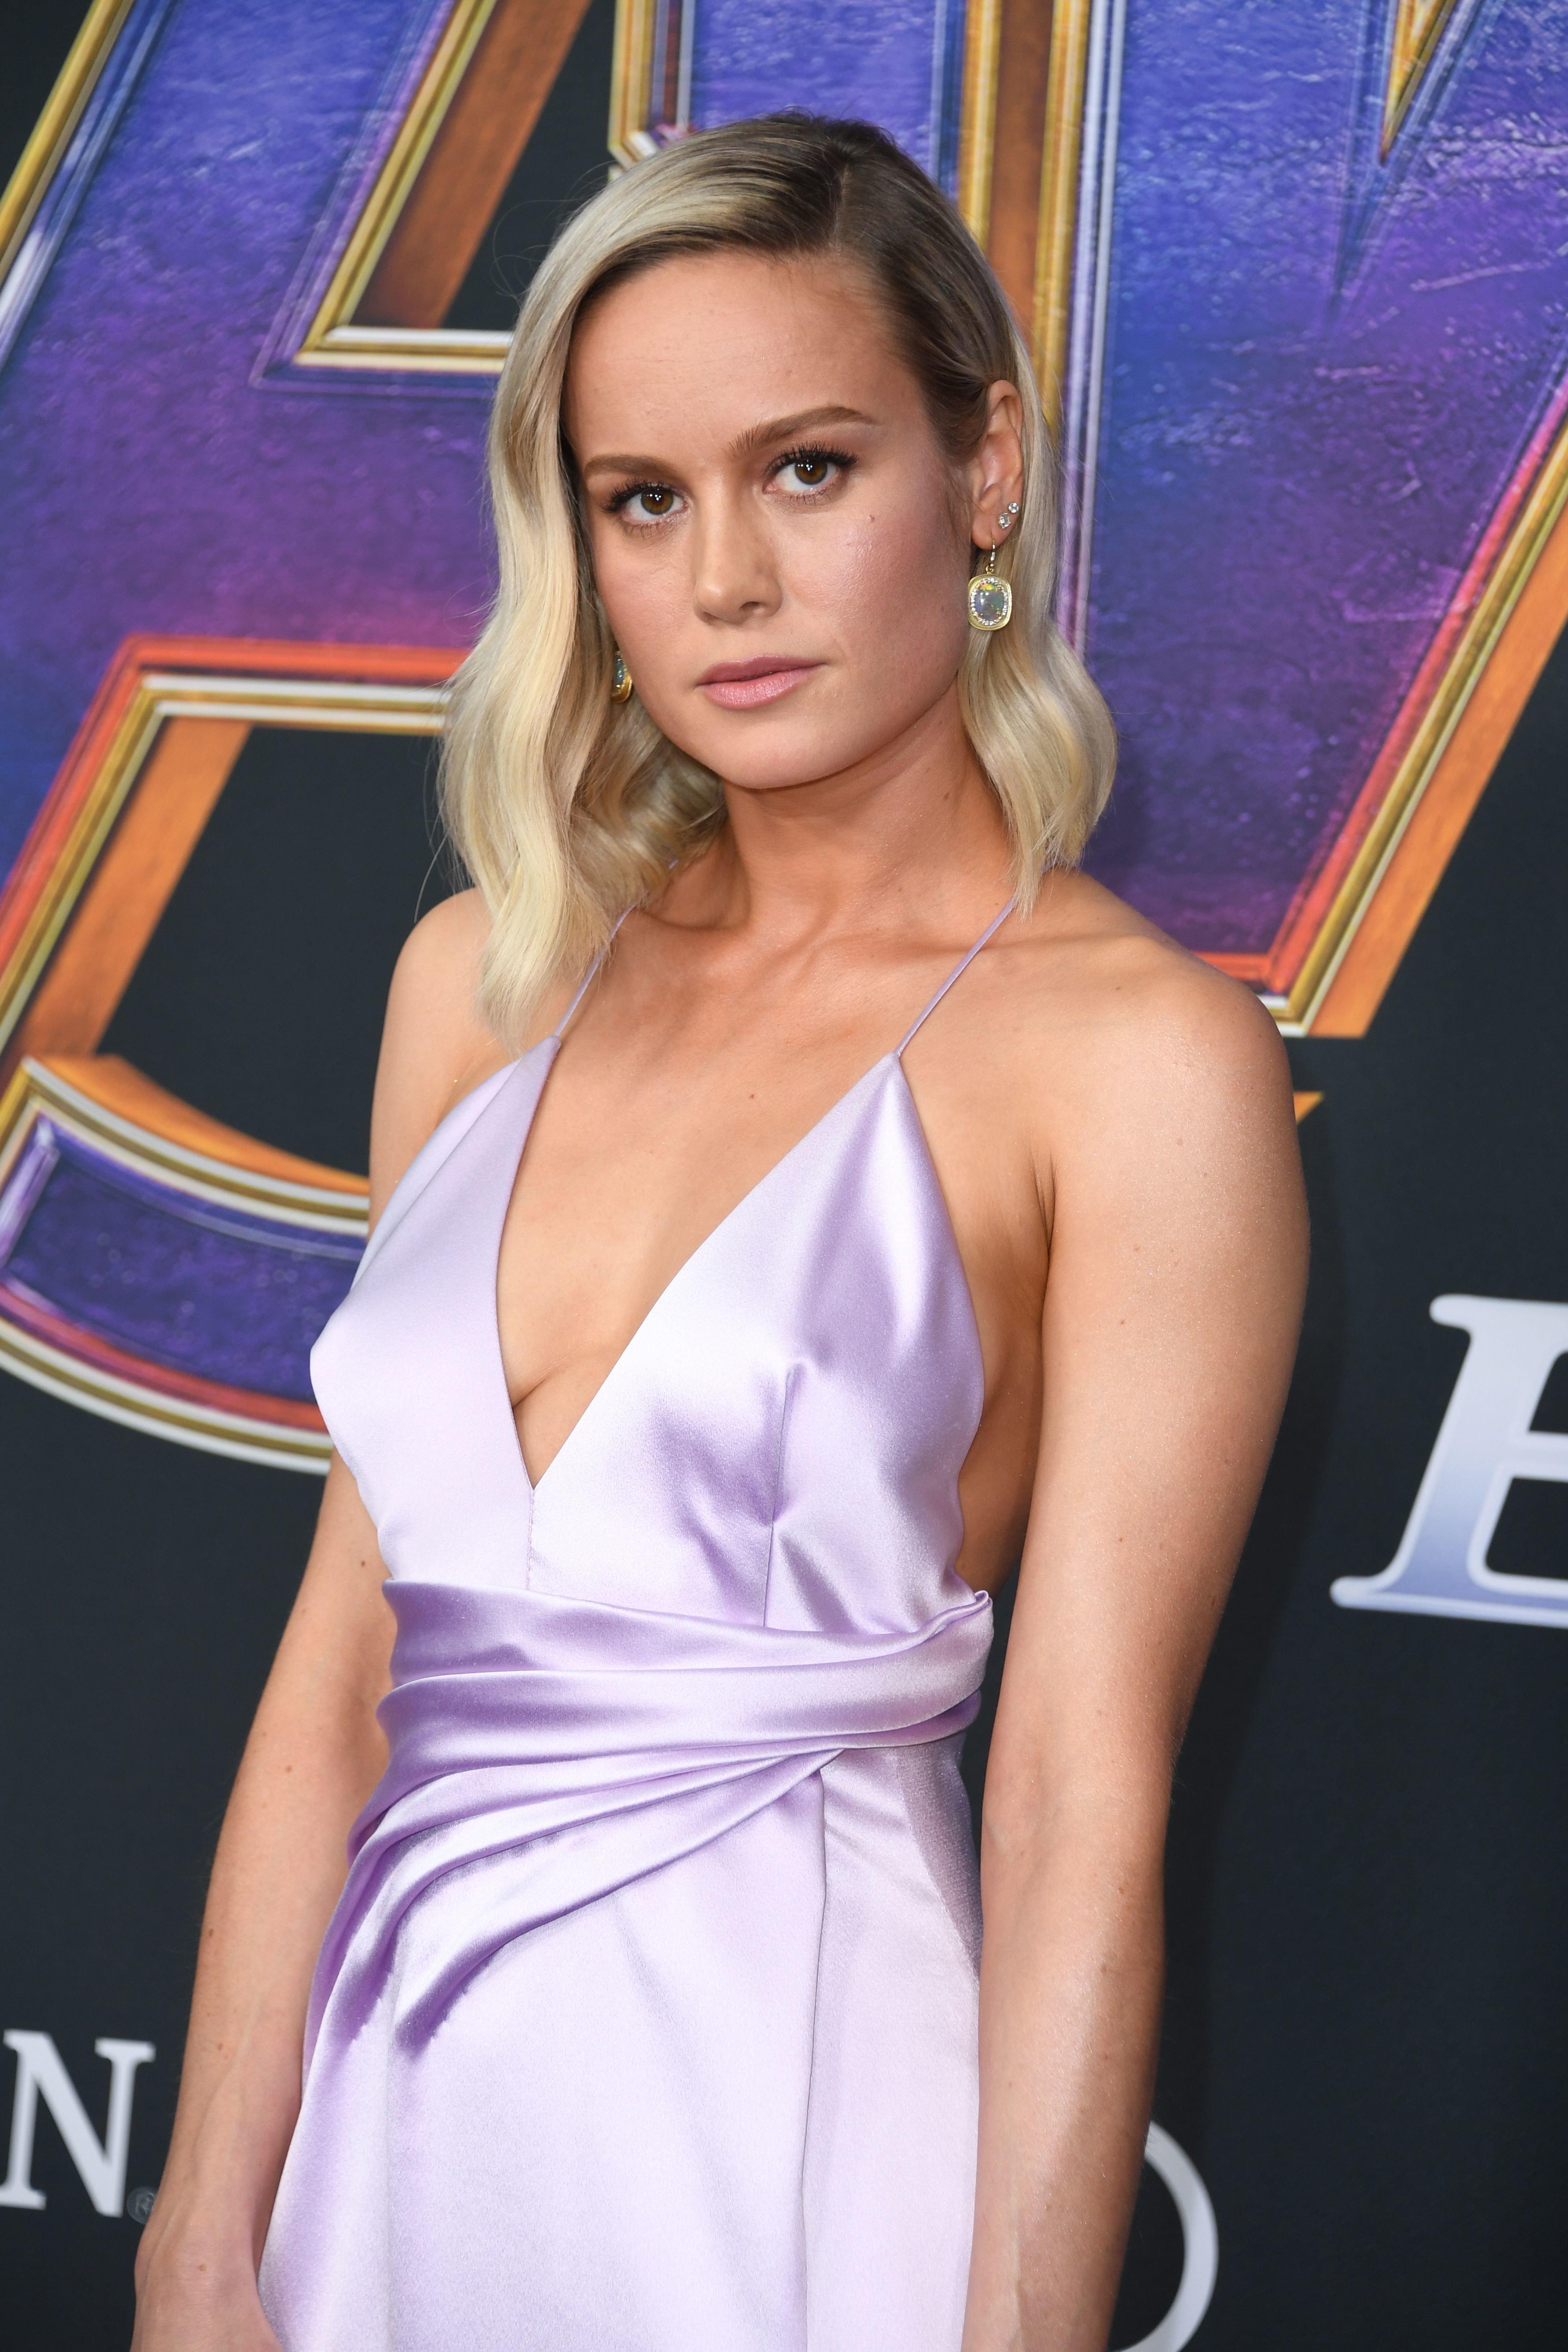 Brie Larson's 'Avengers: Endgame' Premiere ...